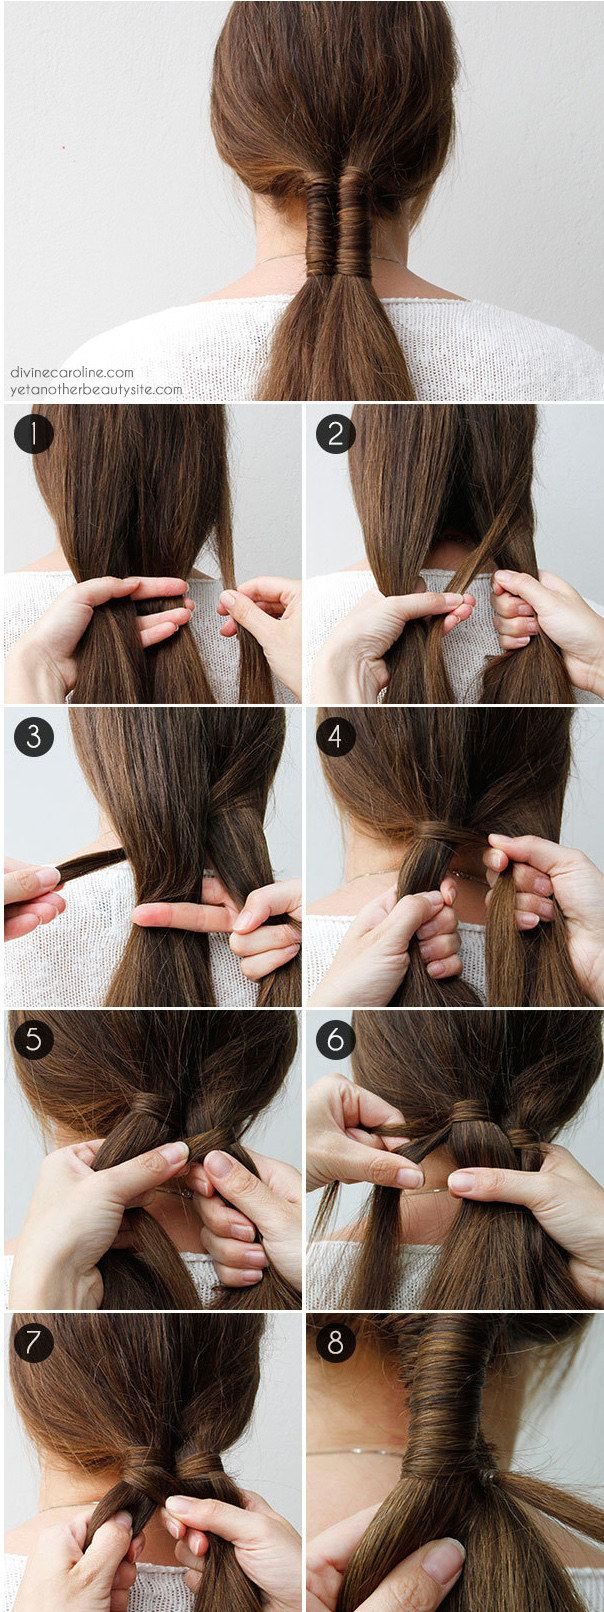 tutoriales de trenzas que querrás probar peinados mamá